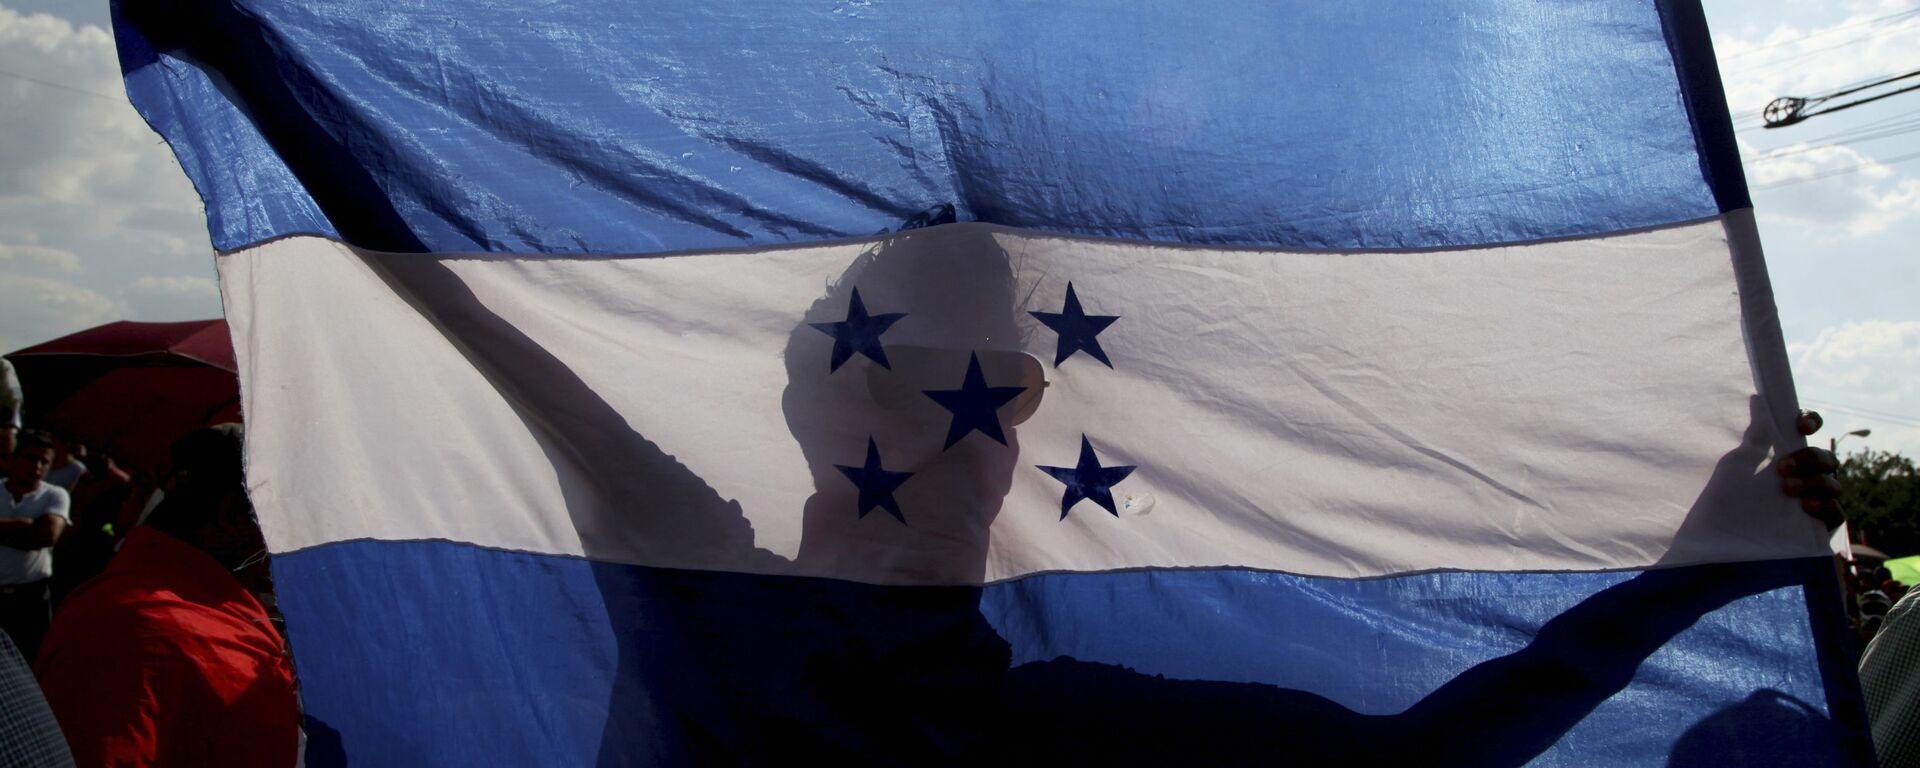 Bandera de Honduras - Sputnik Mundo, 1920, 08.01.2021